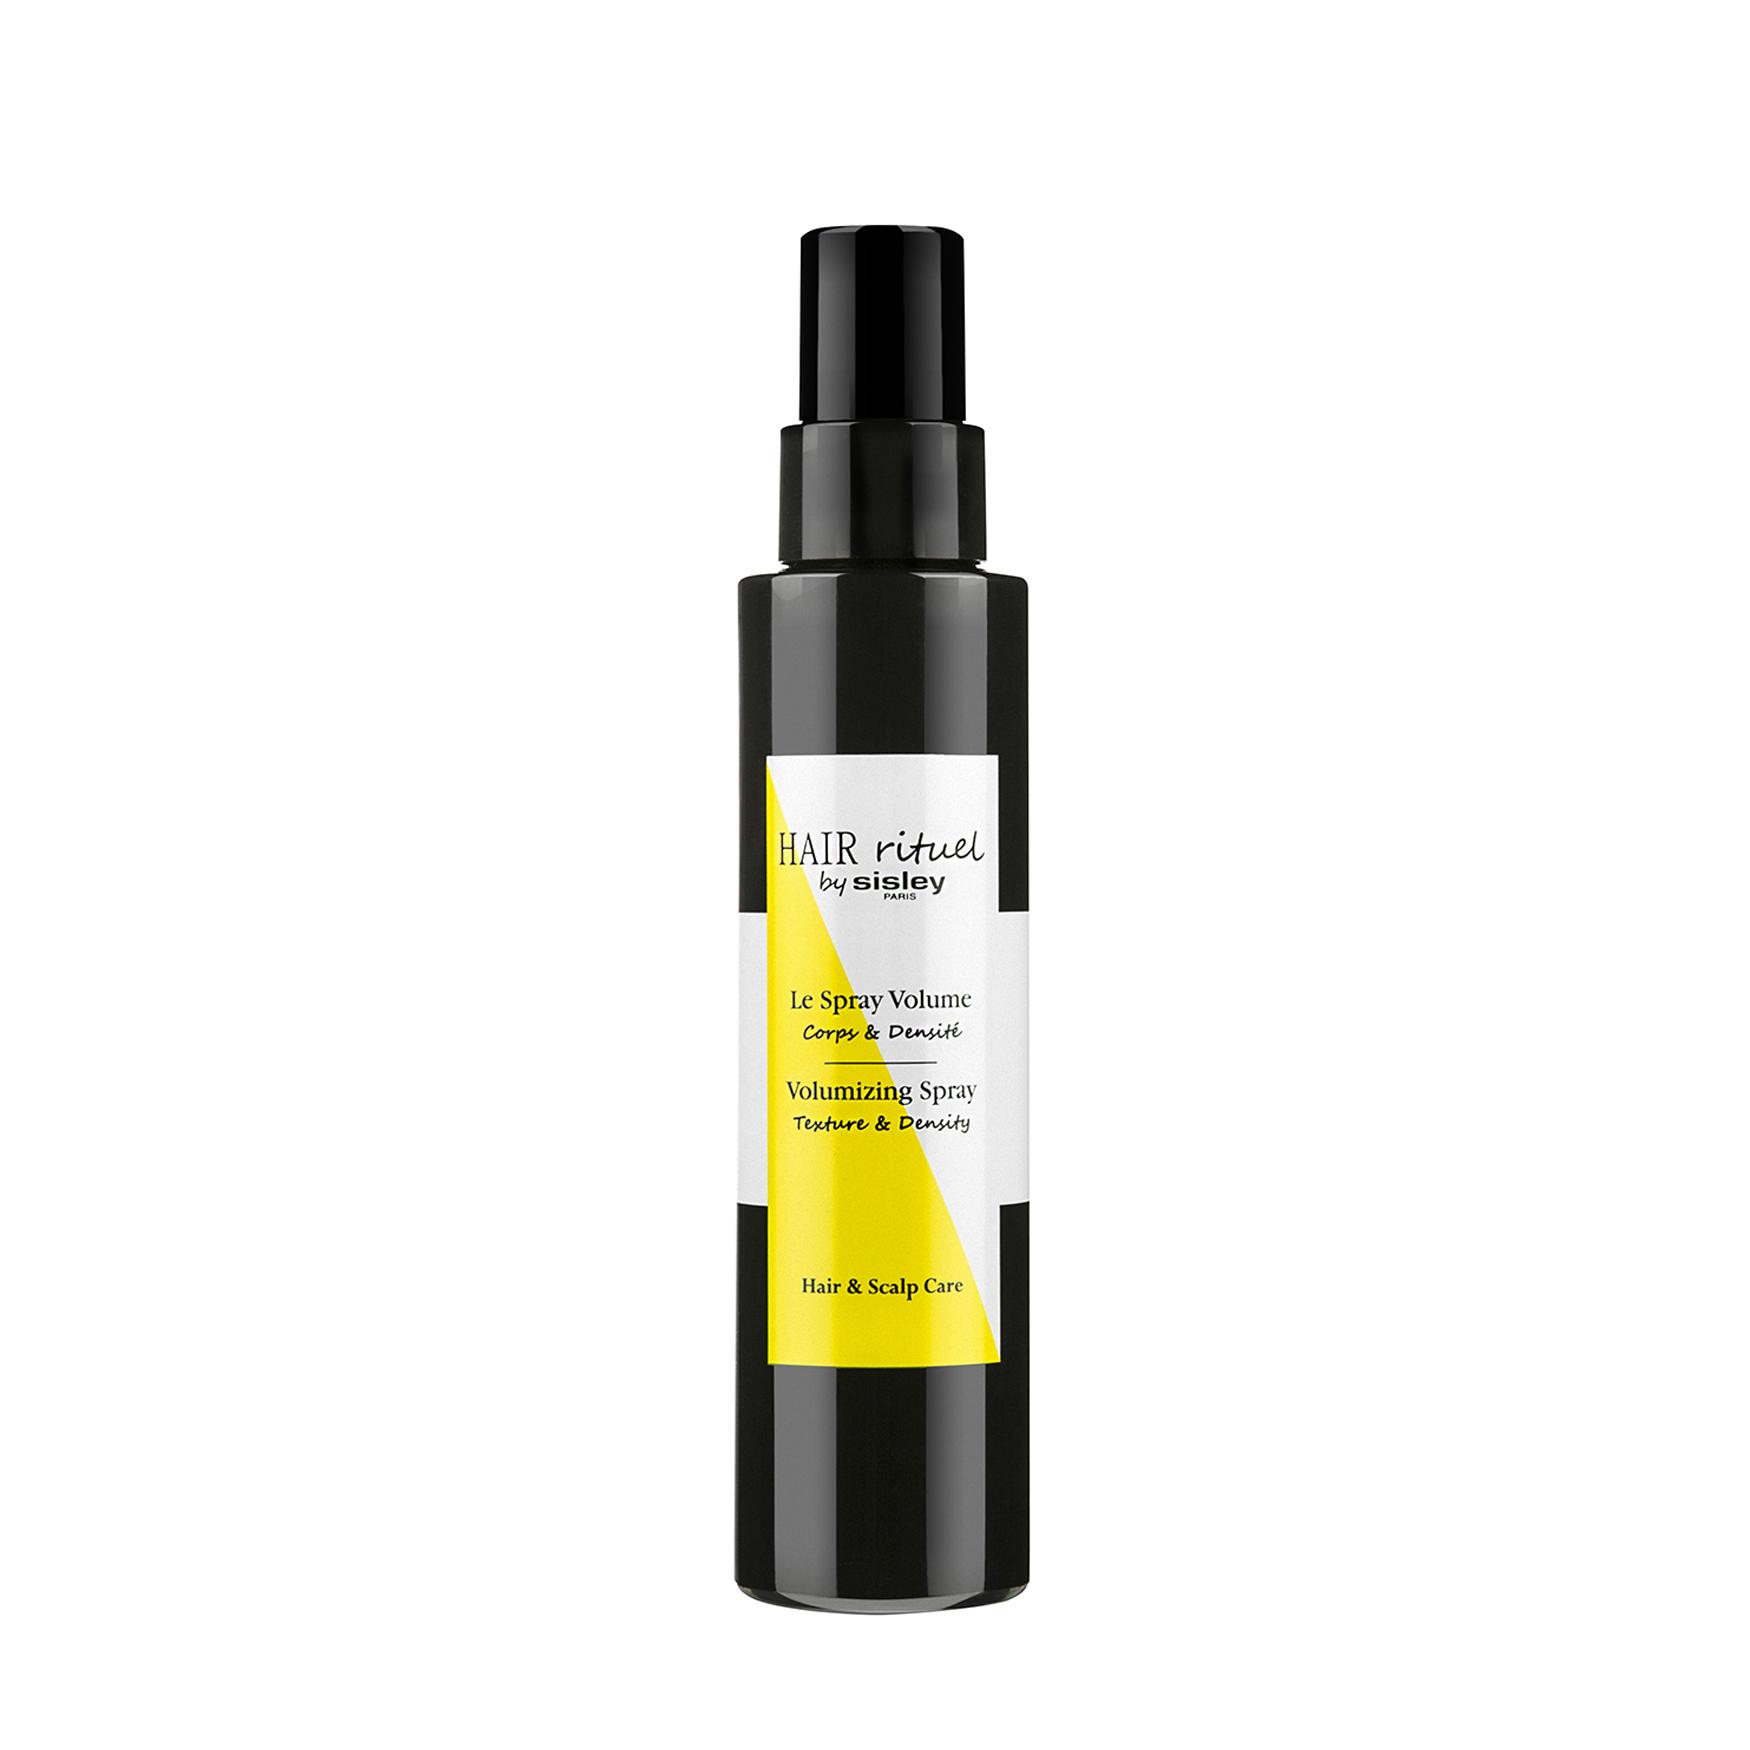 Hair Rituel Volumizing Spray Texture & Density, , large